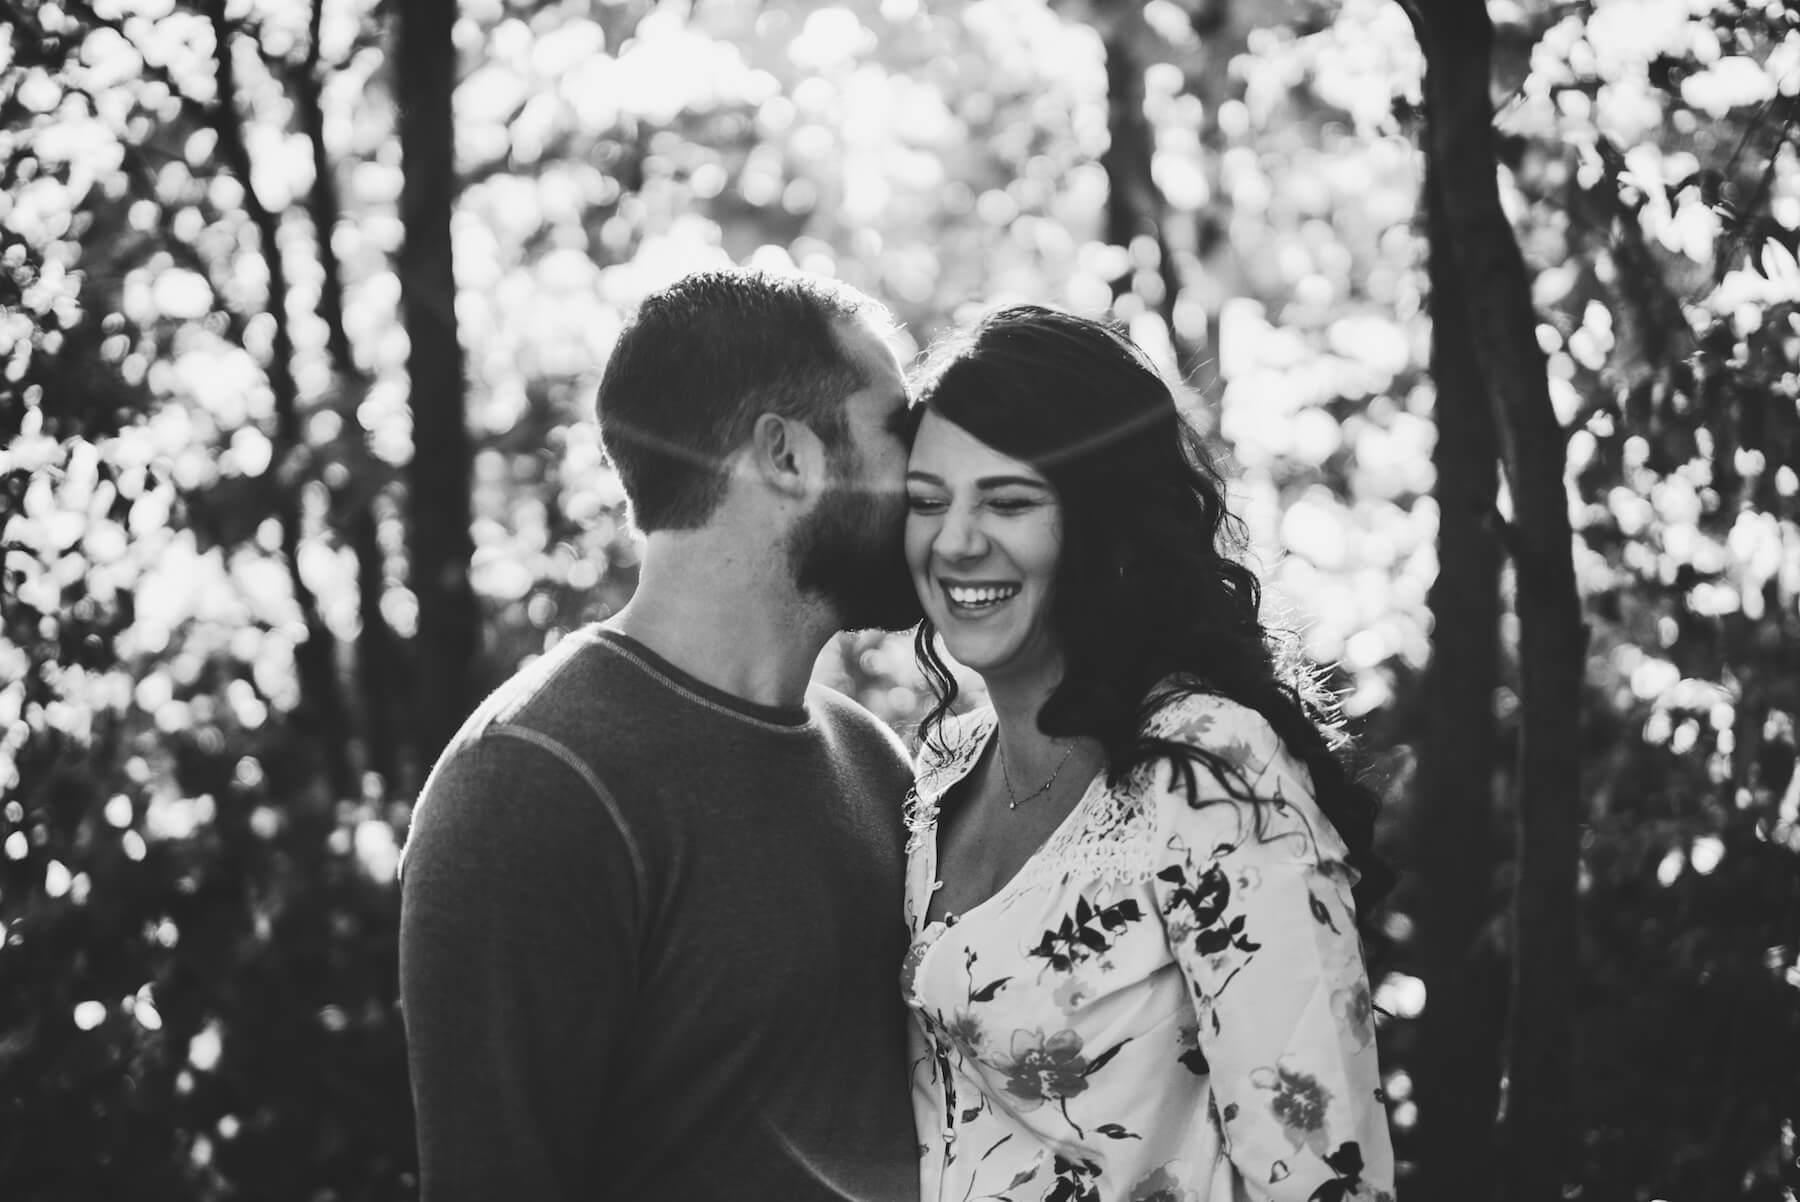 Engle-Olson-Chad-Jen-Engagement-17.jpg